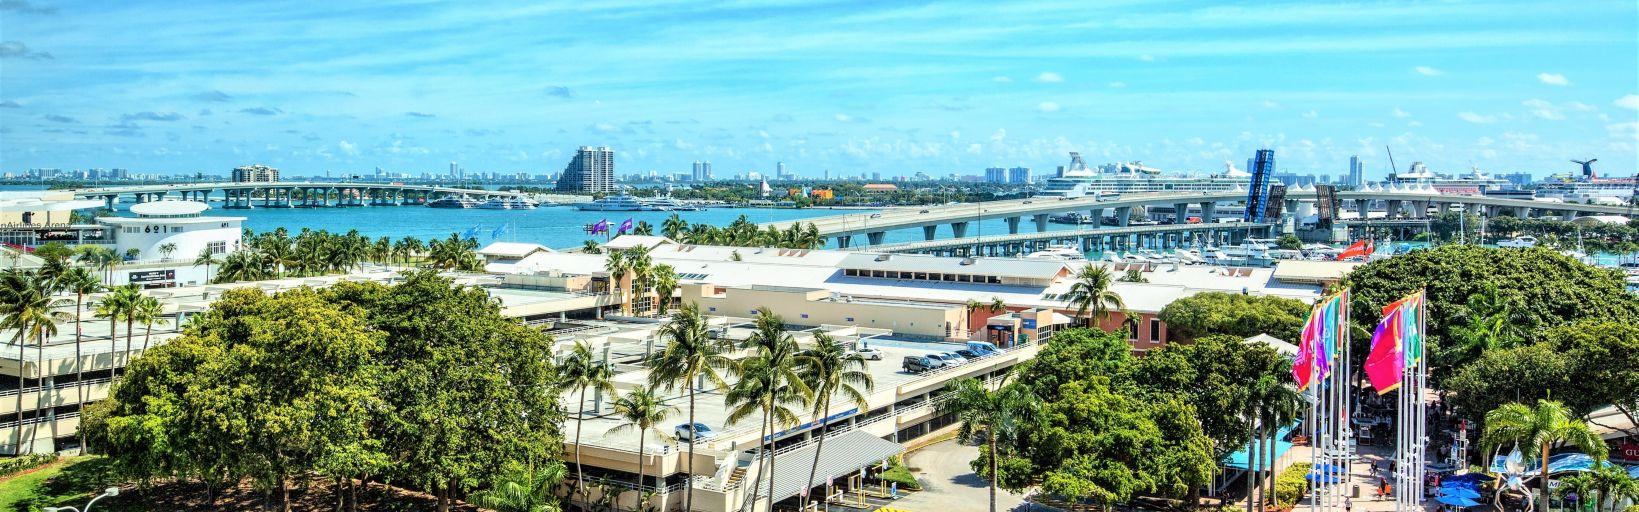 Downtown Miami Florida Hotel Near Cruise Port Holiday Inn - Miami hotels close to cruise ship port